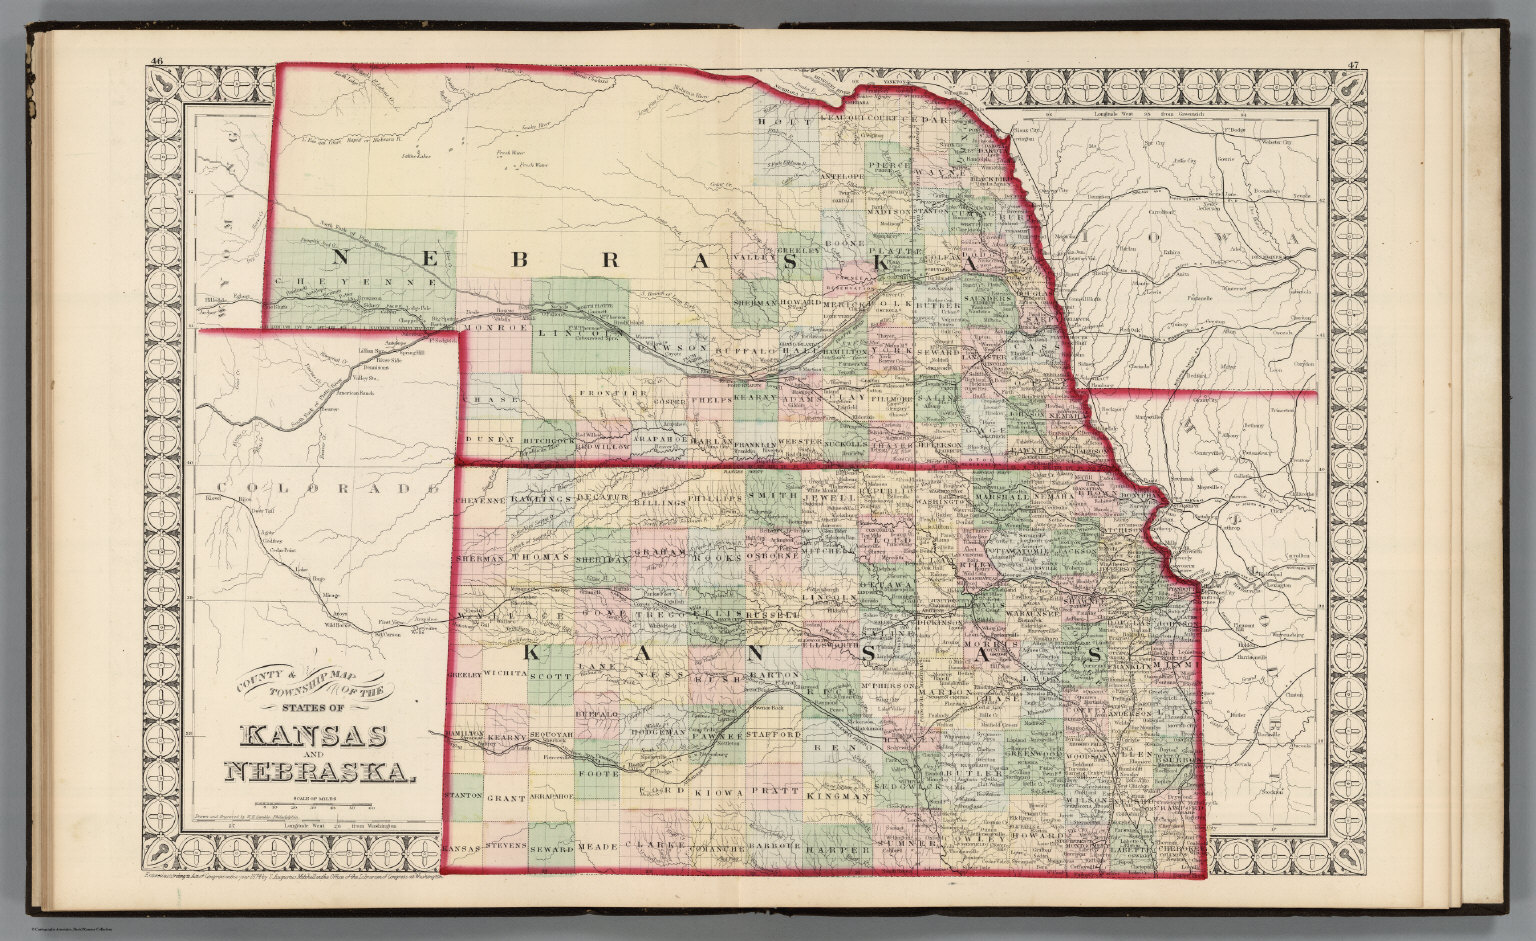 county township map of the states of kansas and nebraska david